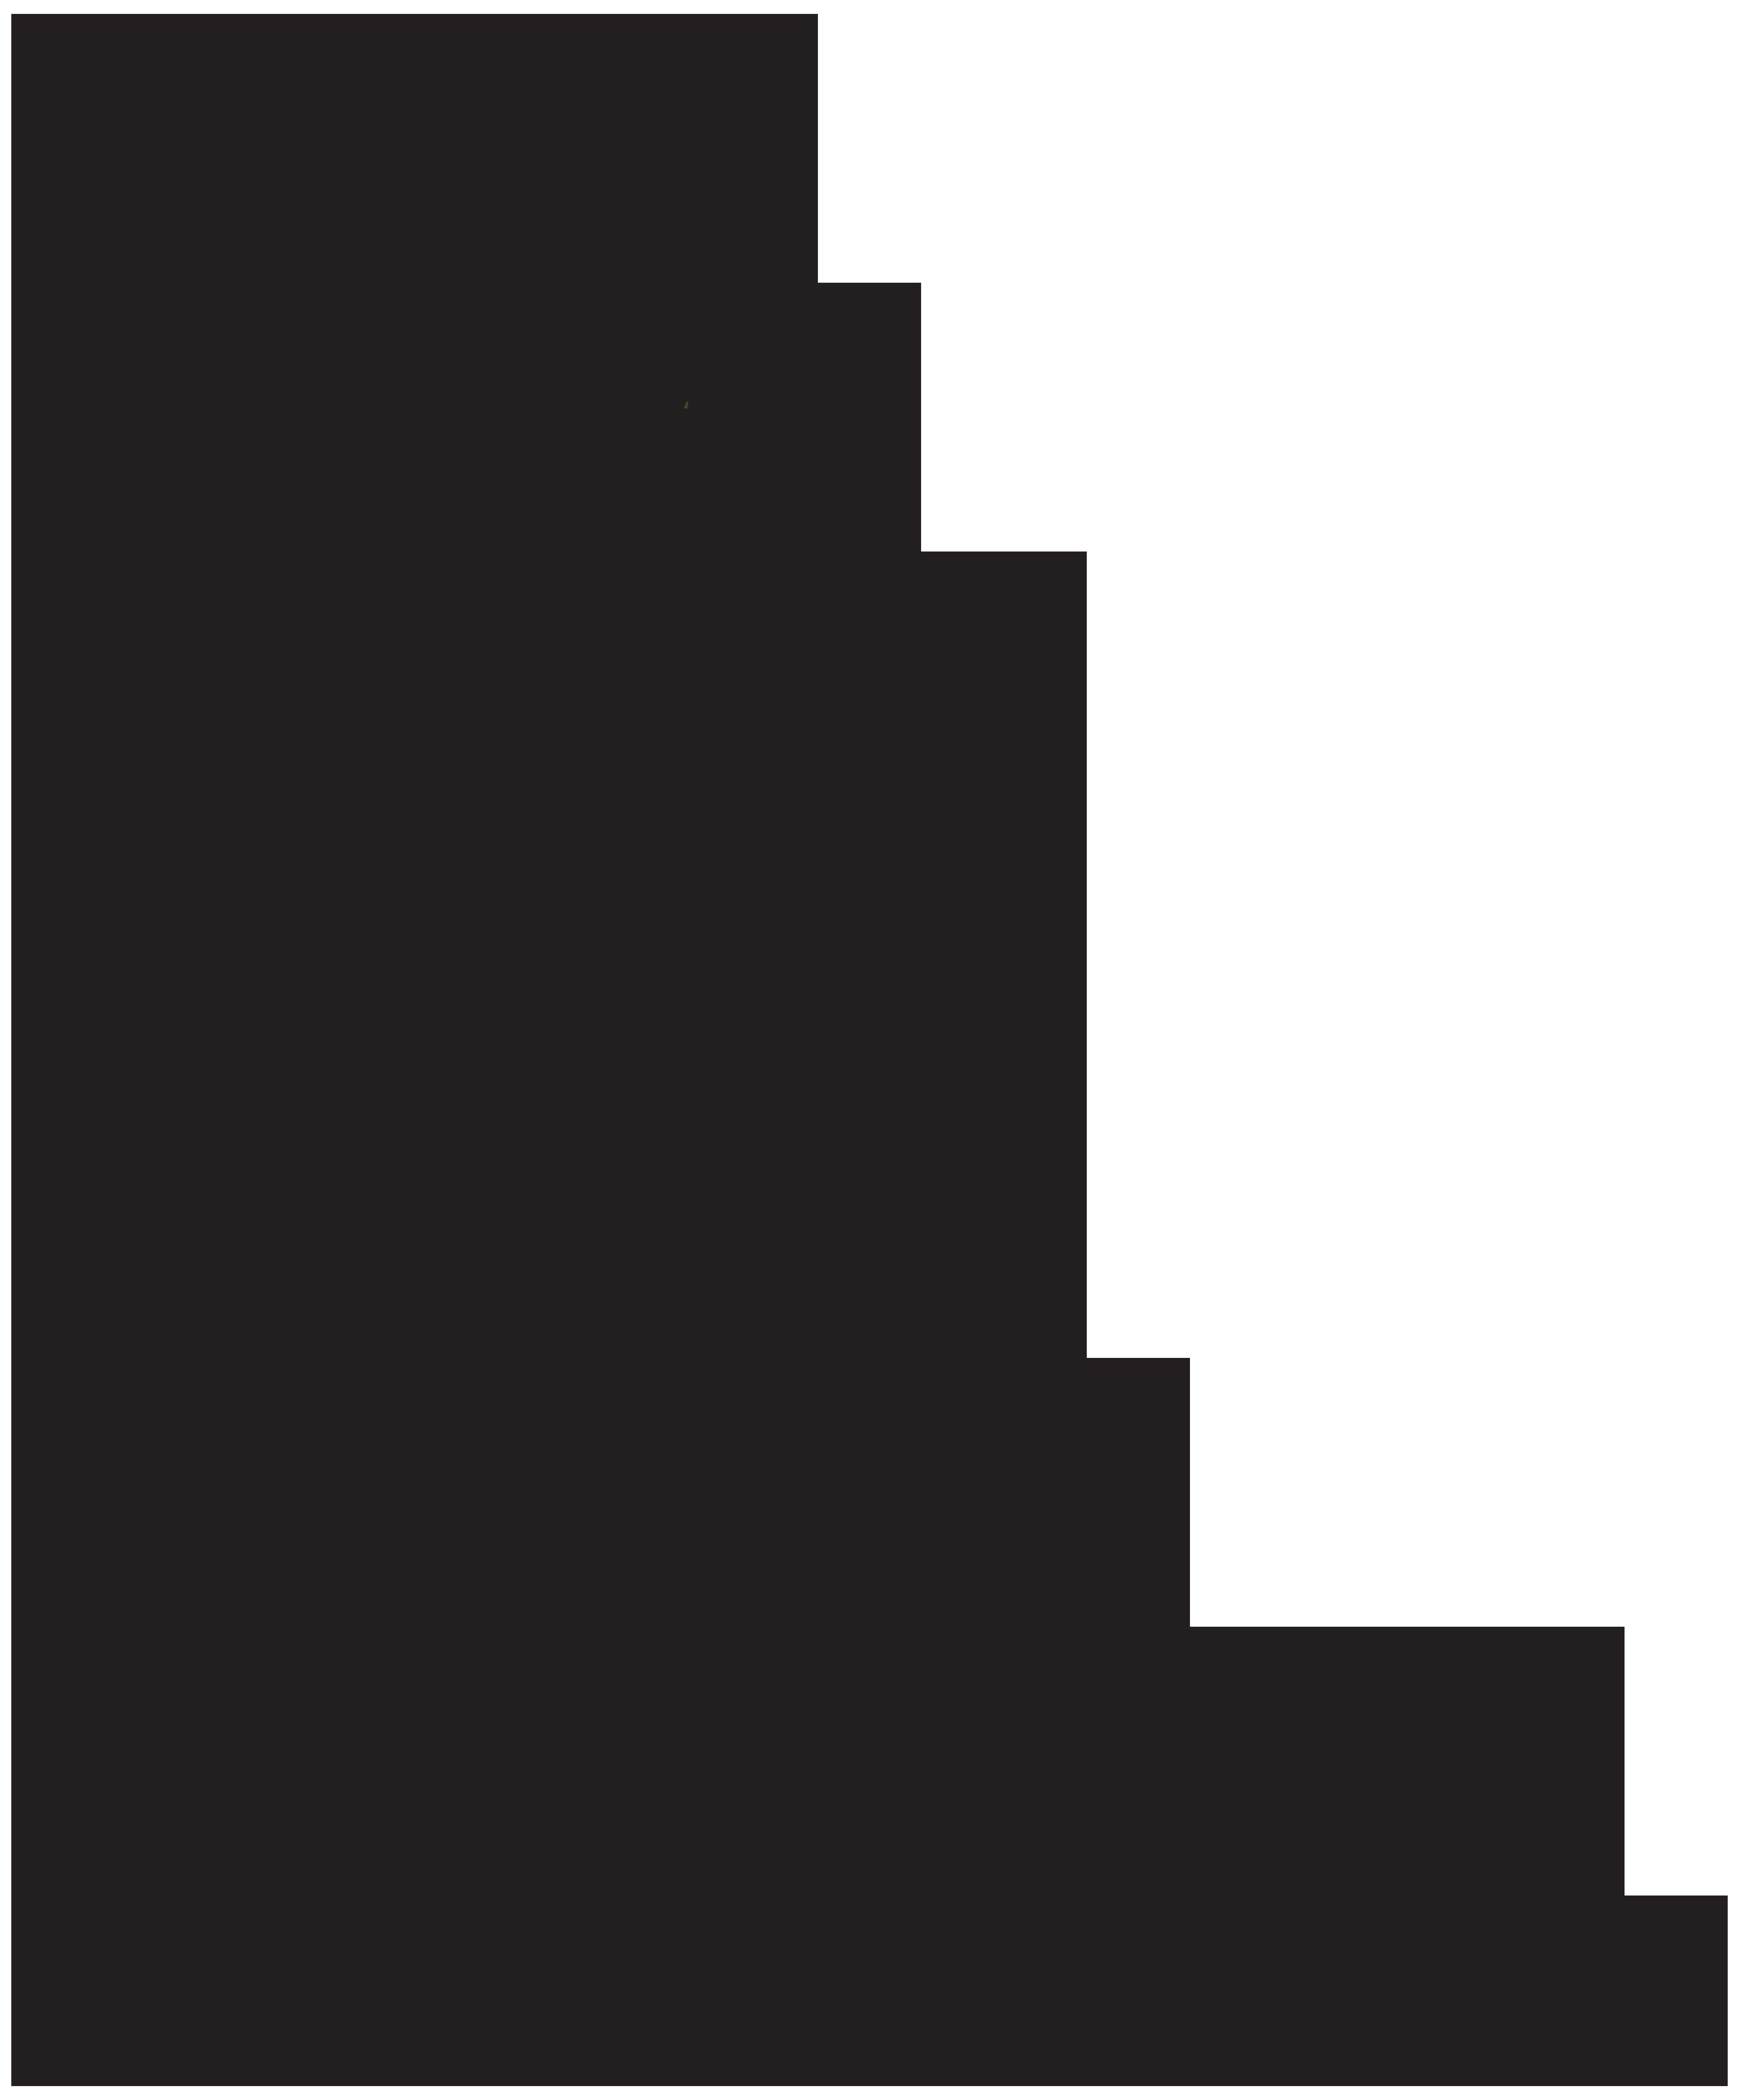 Groom and bride png. Dress clipart flower girl dress